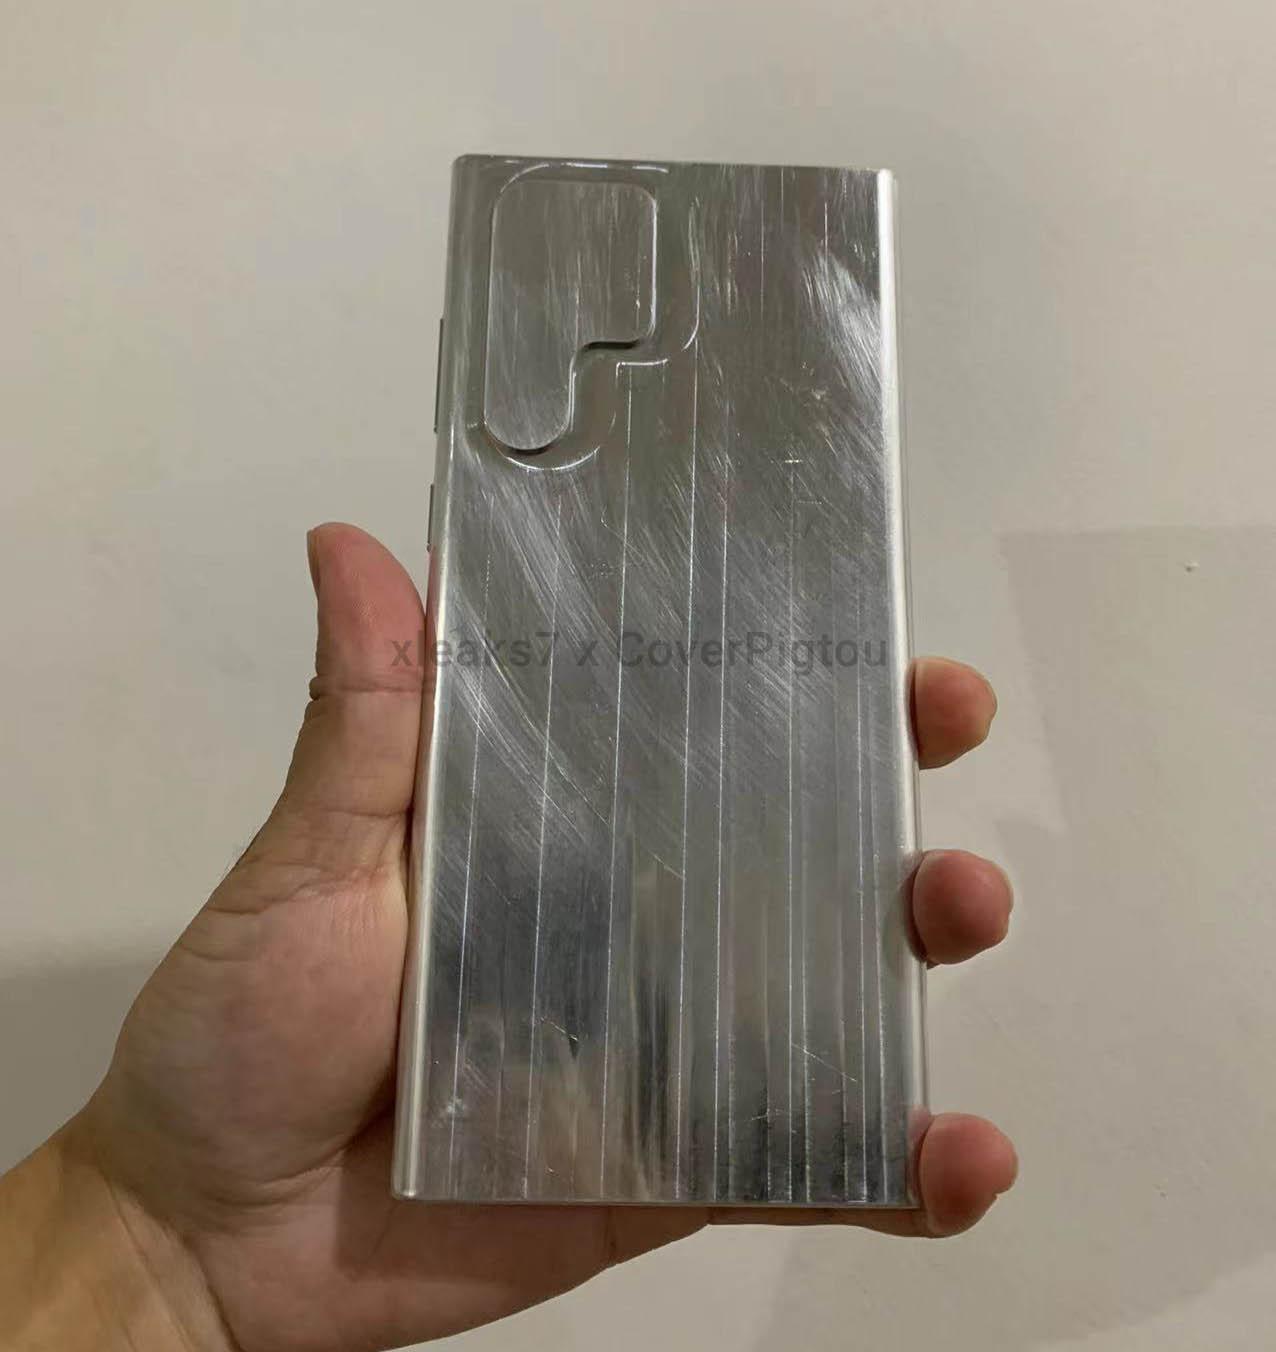 Макет со странным дизайном Samsung Galaxy S22 Ultra Samsung  - maket_pokazal_vse_tonkosti_strannogo_dizajna_samsung_galaxy_s22_ultra_picture2_1